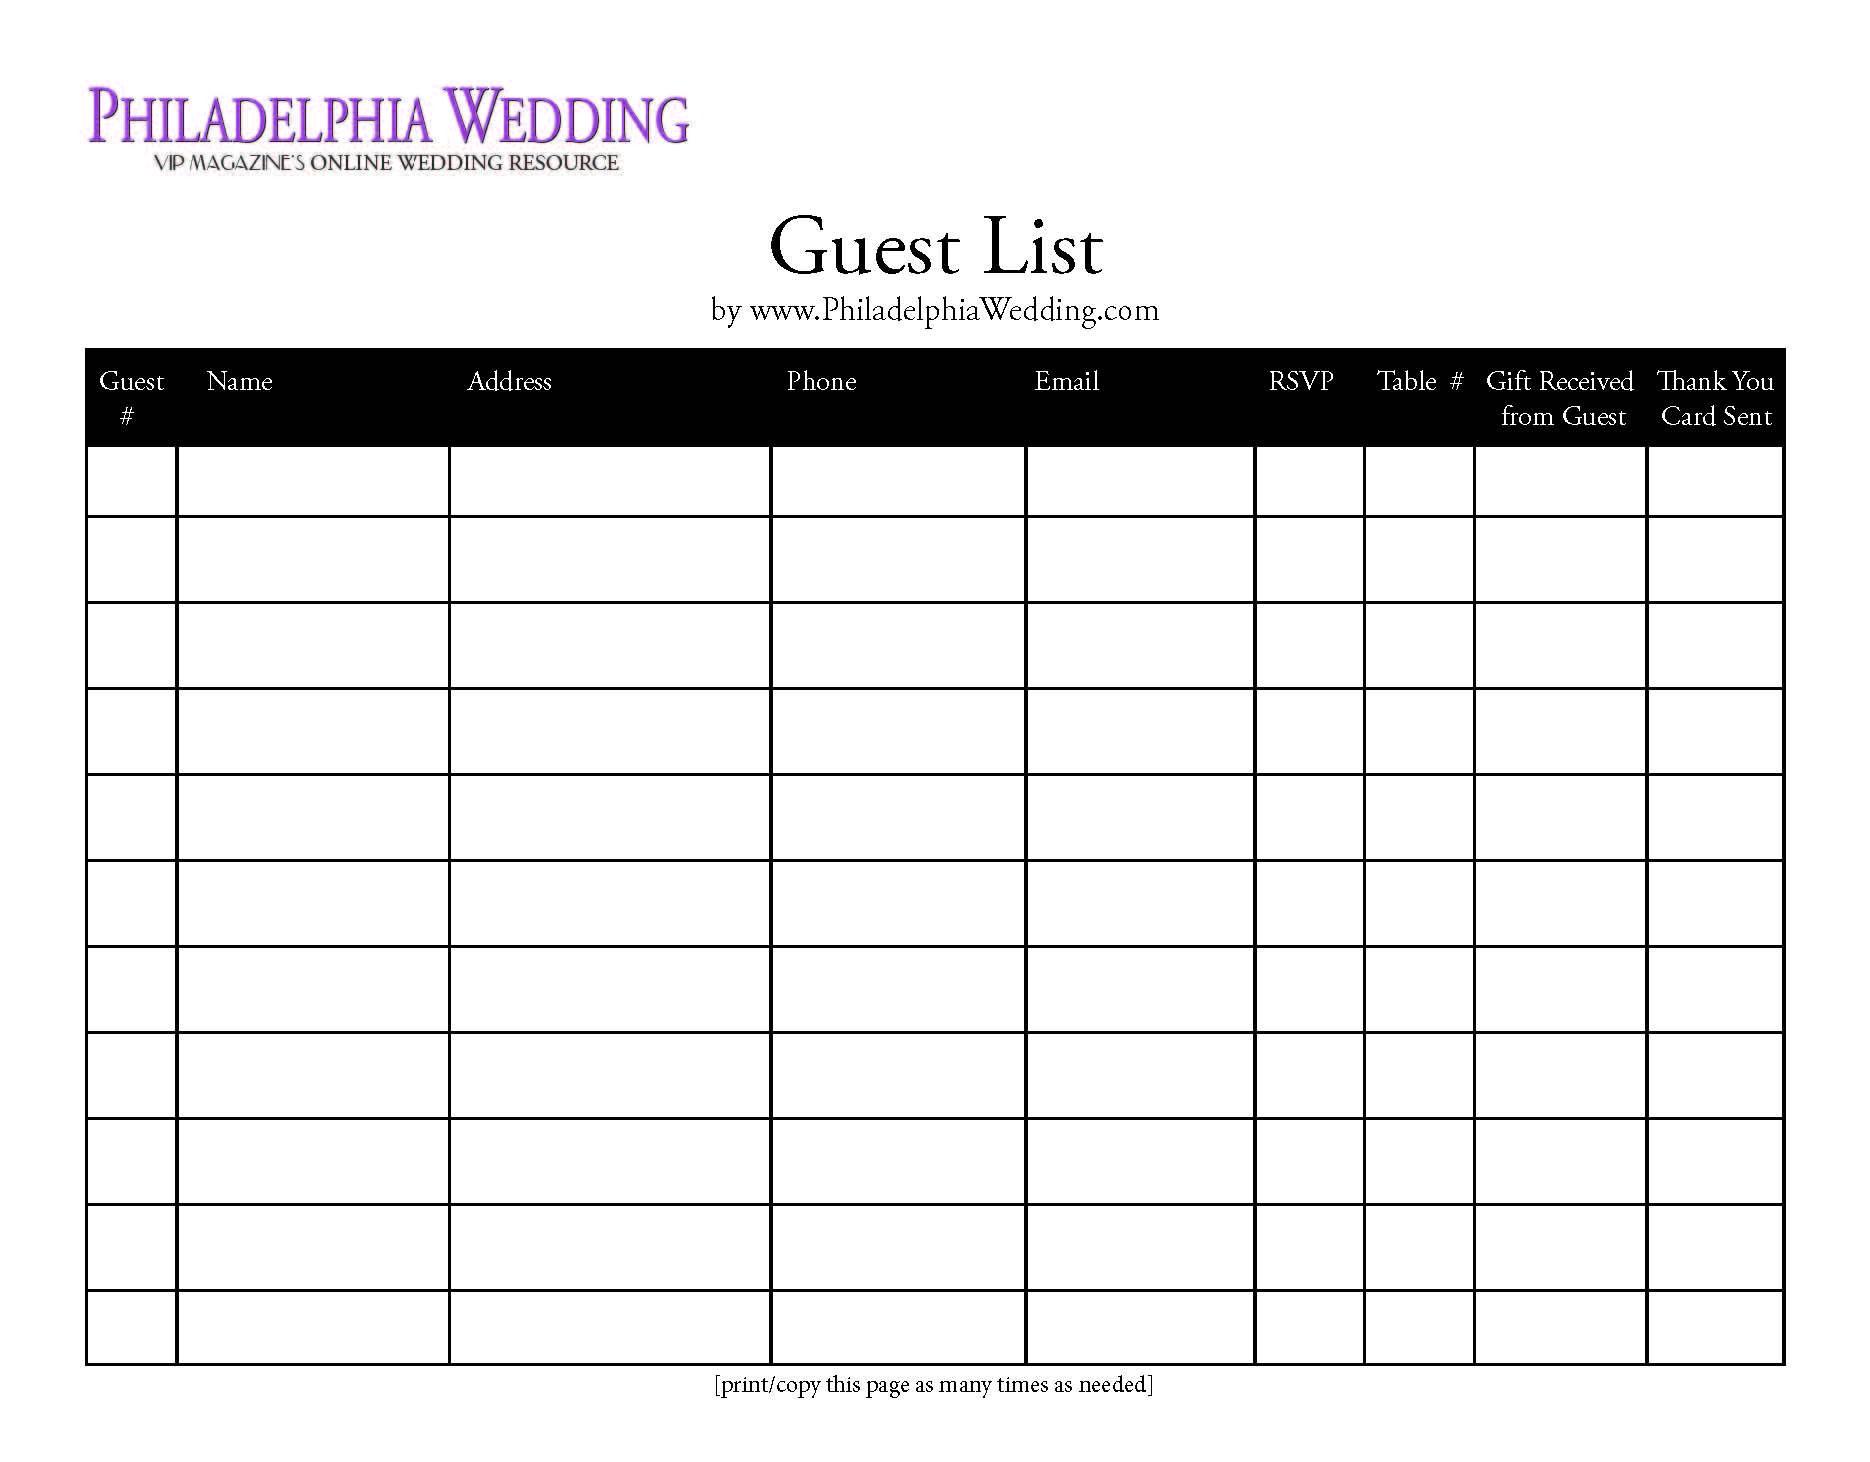 Wedding Guest List | Wedding Invitation List, Wedding Guest | Wedding Guest List Worksheet Printable